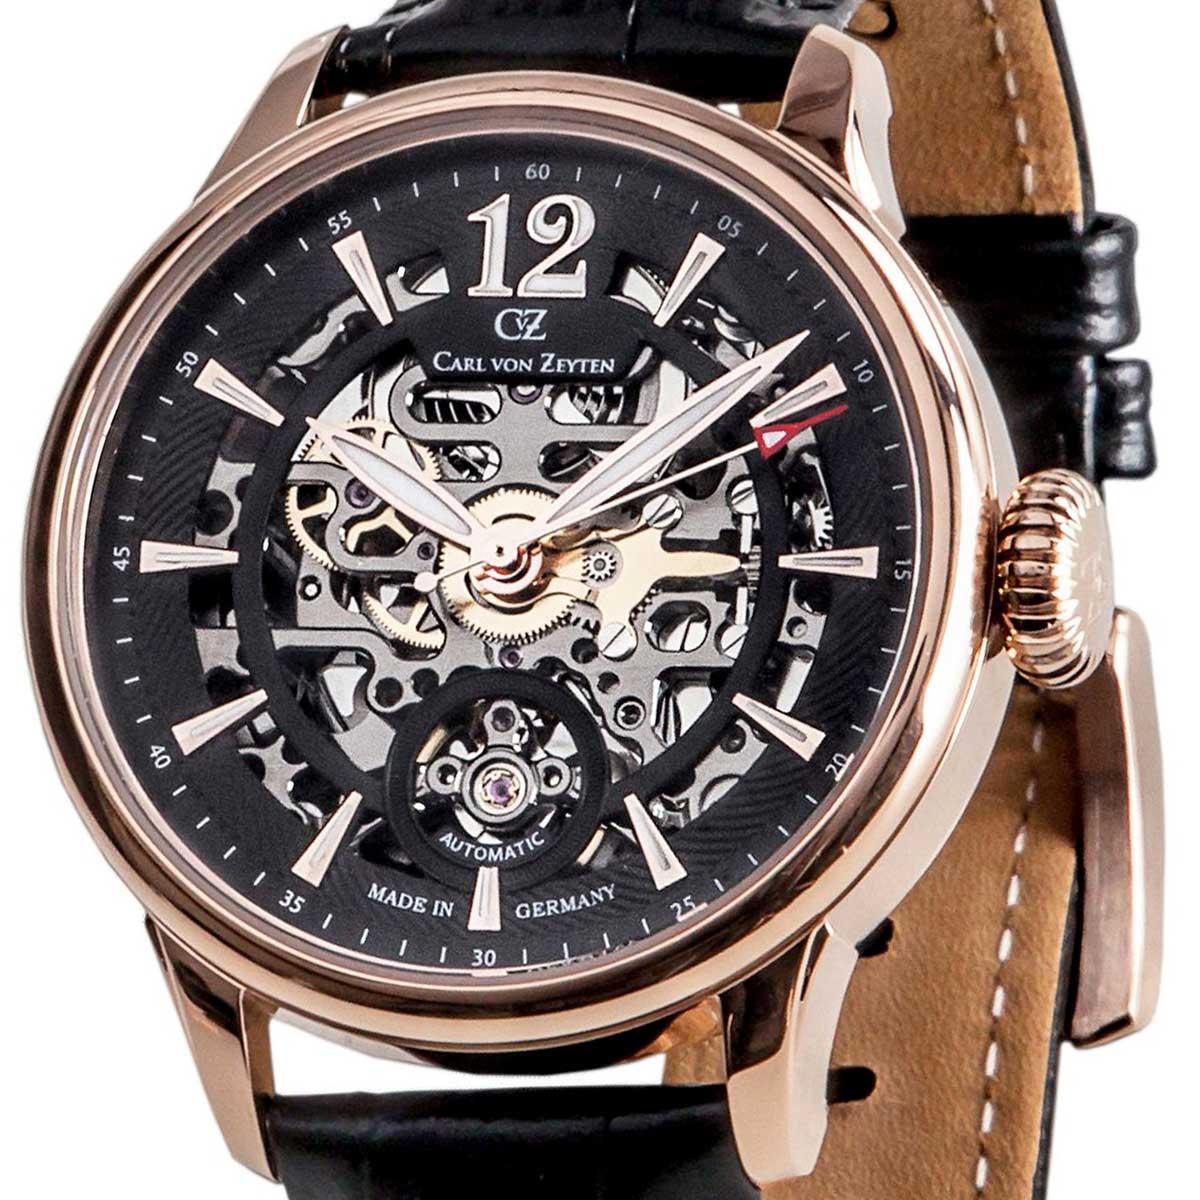 Carl von Zeyten カール・フォン・ツォイテン 自動巻き(手巻き機能あり) 腕時計 [CvZ0051RBK] 正規代理店品